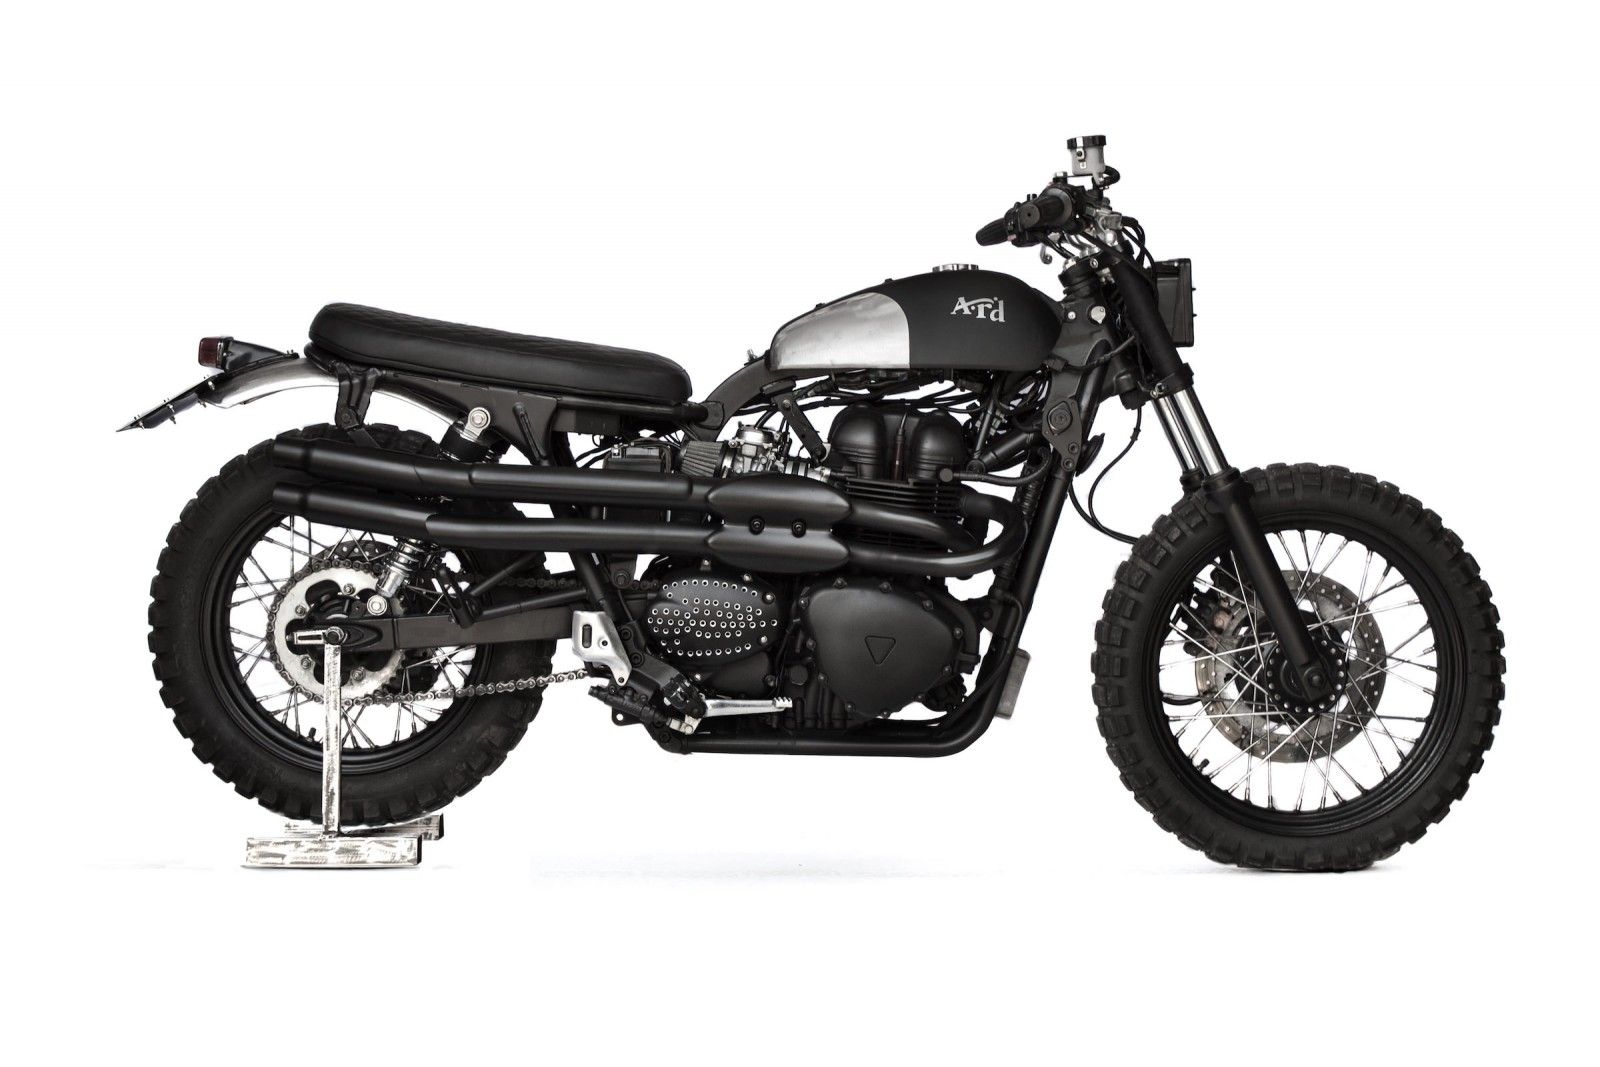 Triumph-Scrambler-Motorbike-2  #triumph #motorcycle #scrambler #bike #italian #british